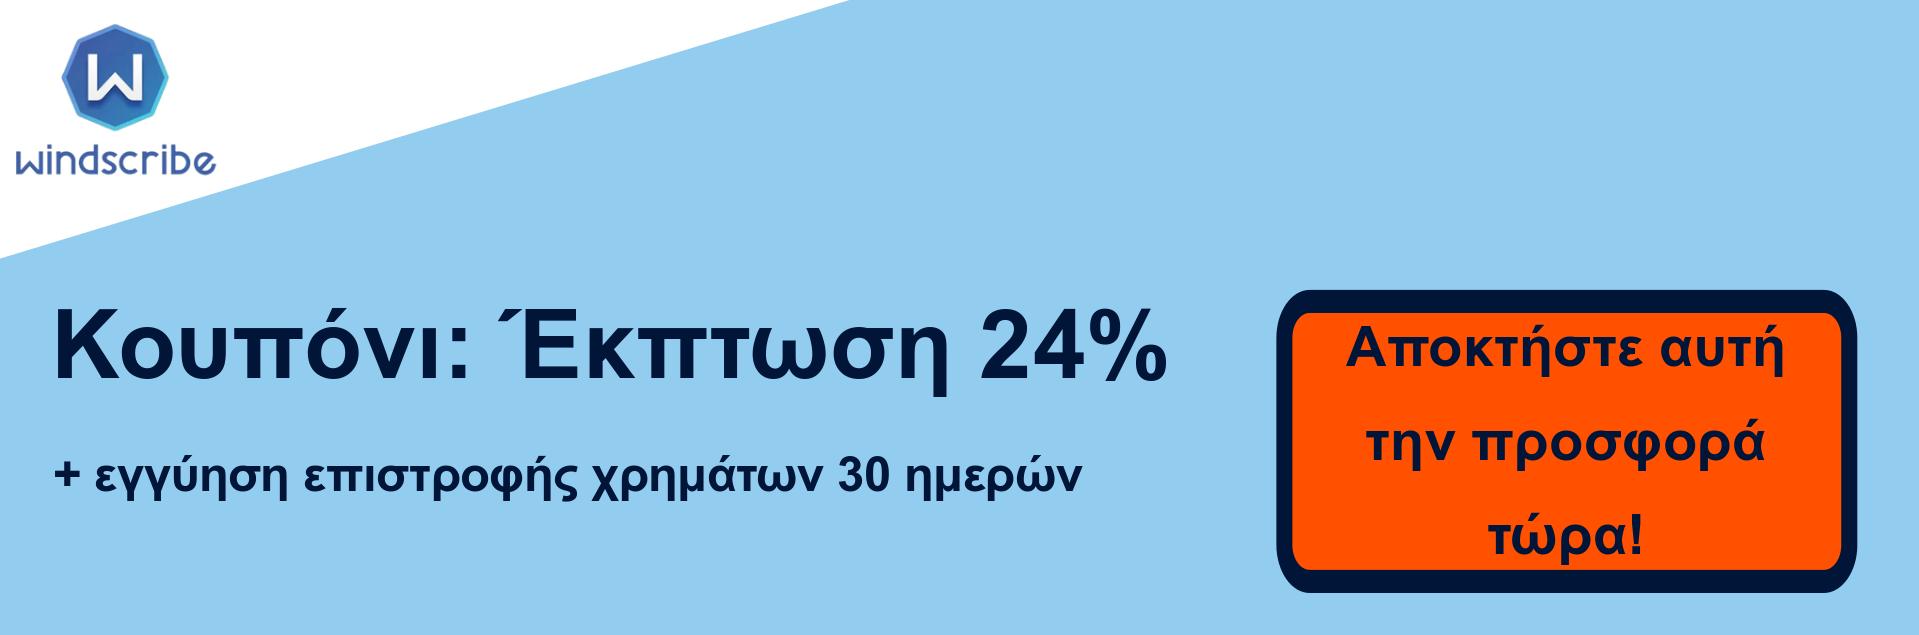 WindScribe VPN κουπόνι banner - έκπτωση 24%